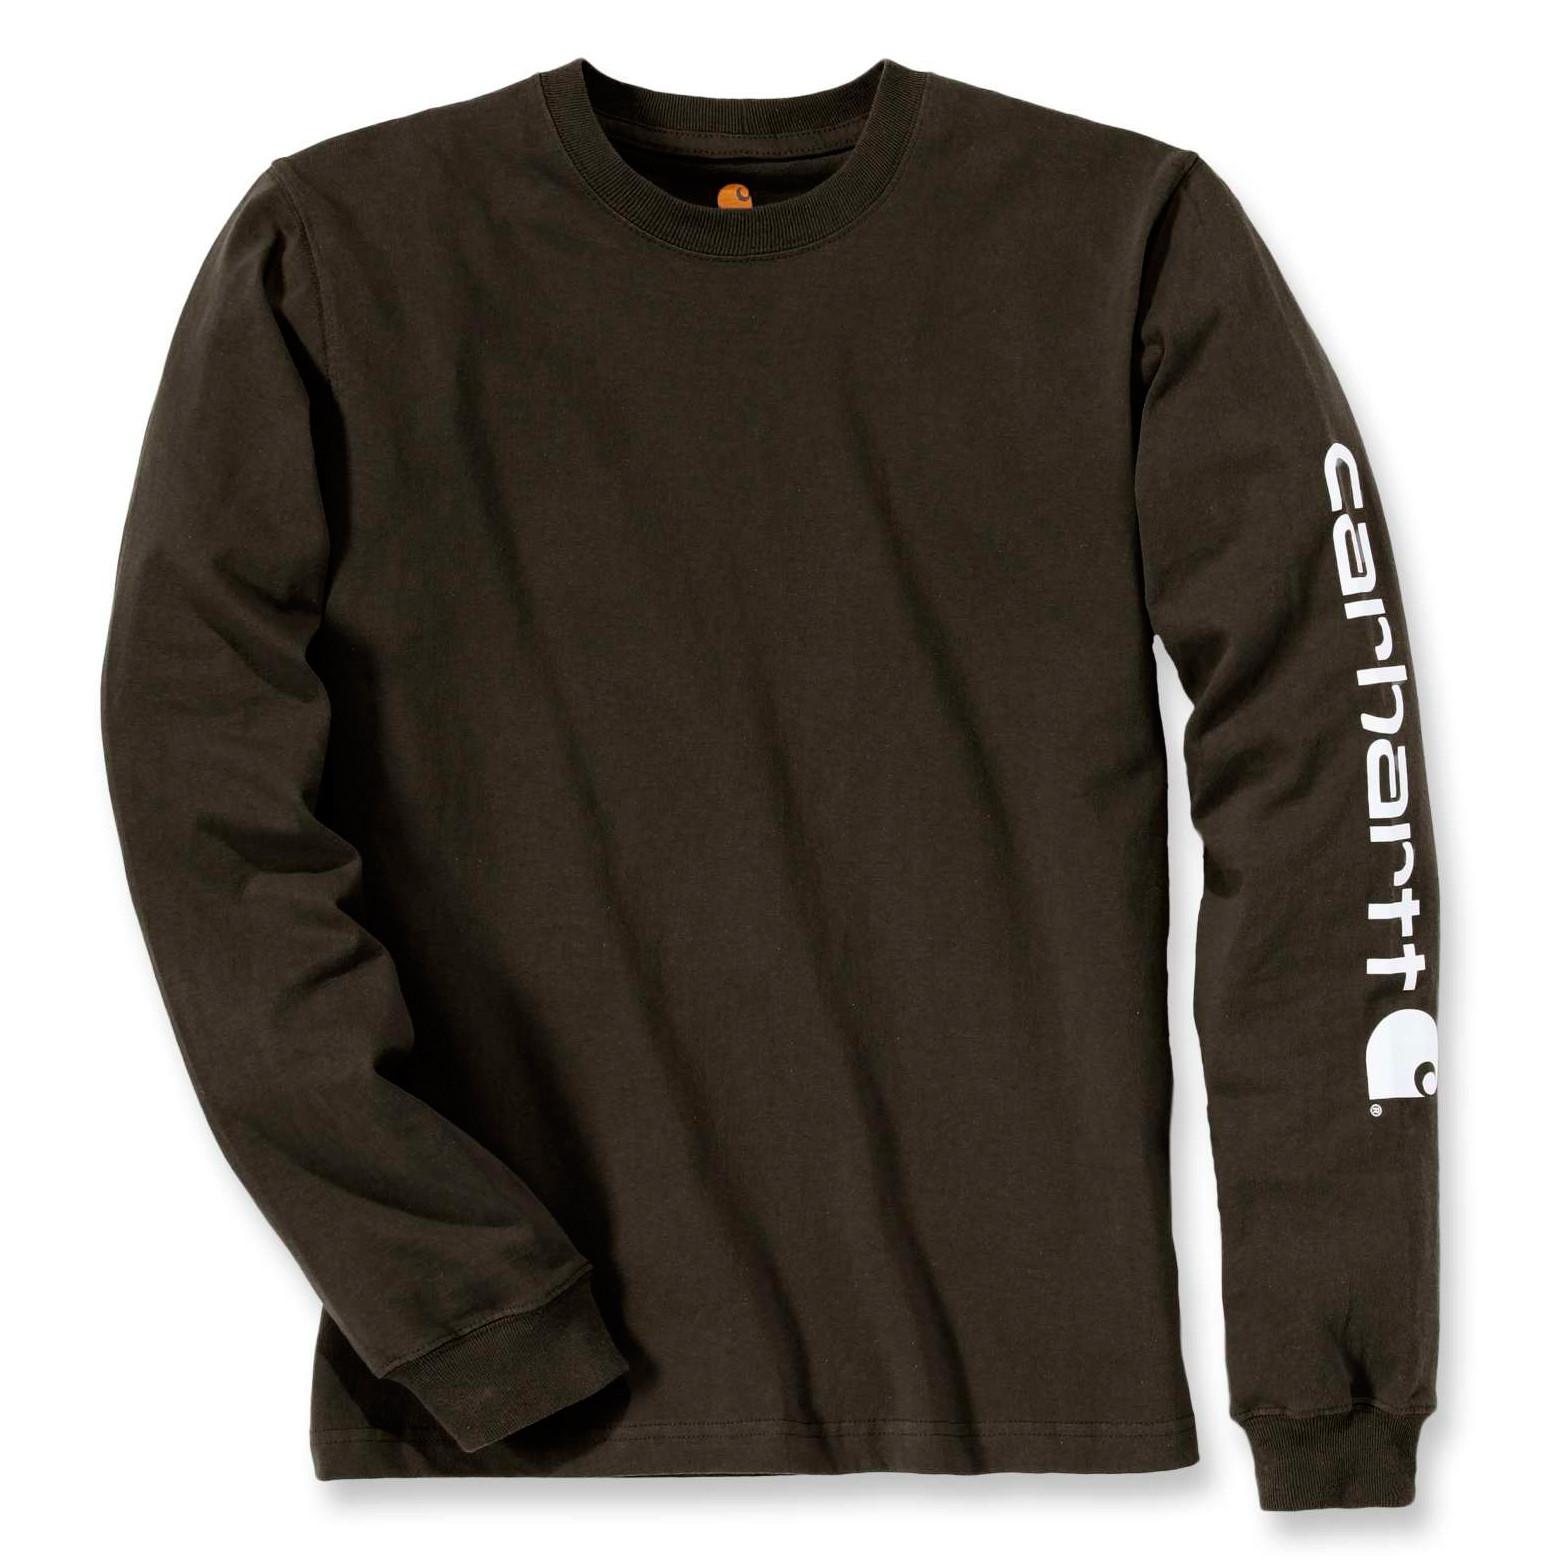 Футболка с длинным рукавом Carhartt Sleeve Logo T-Shirt L/S - EK231 (Peat, L)